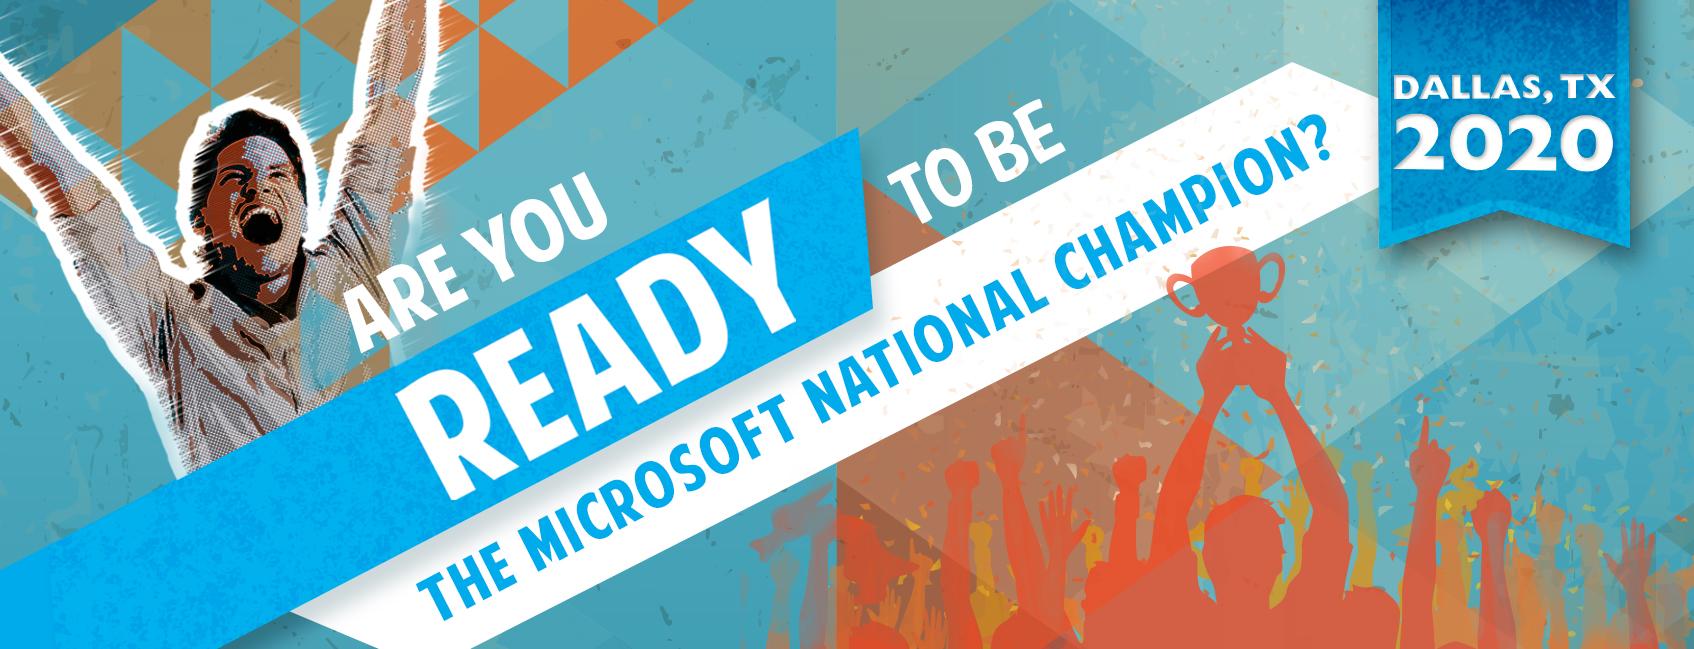 Microsoft Office Specialist World Championship